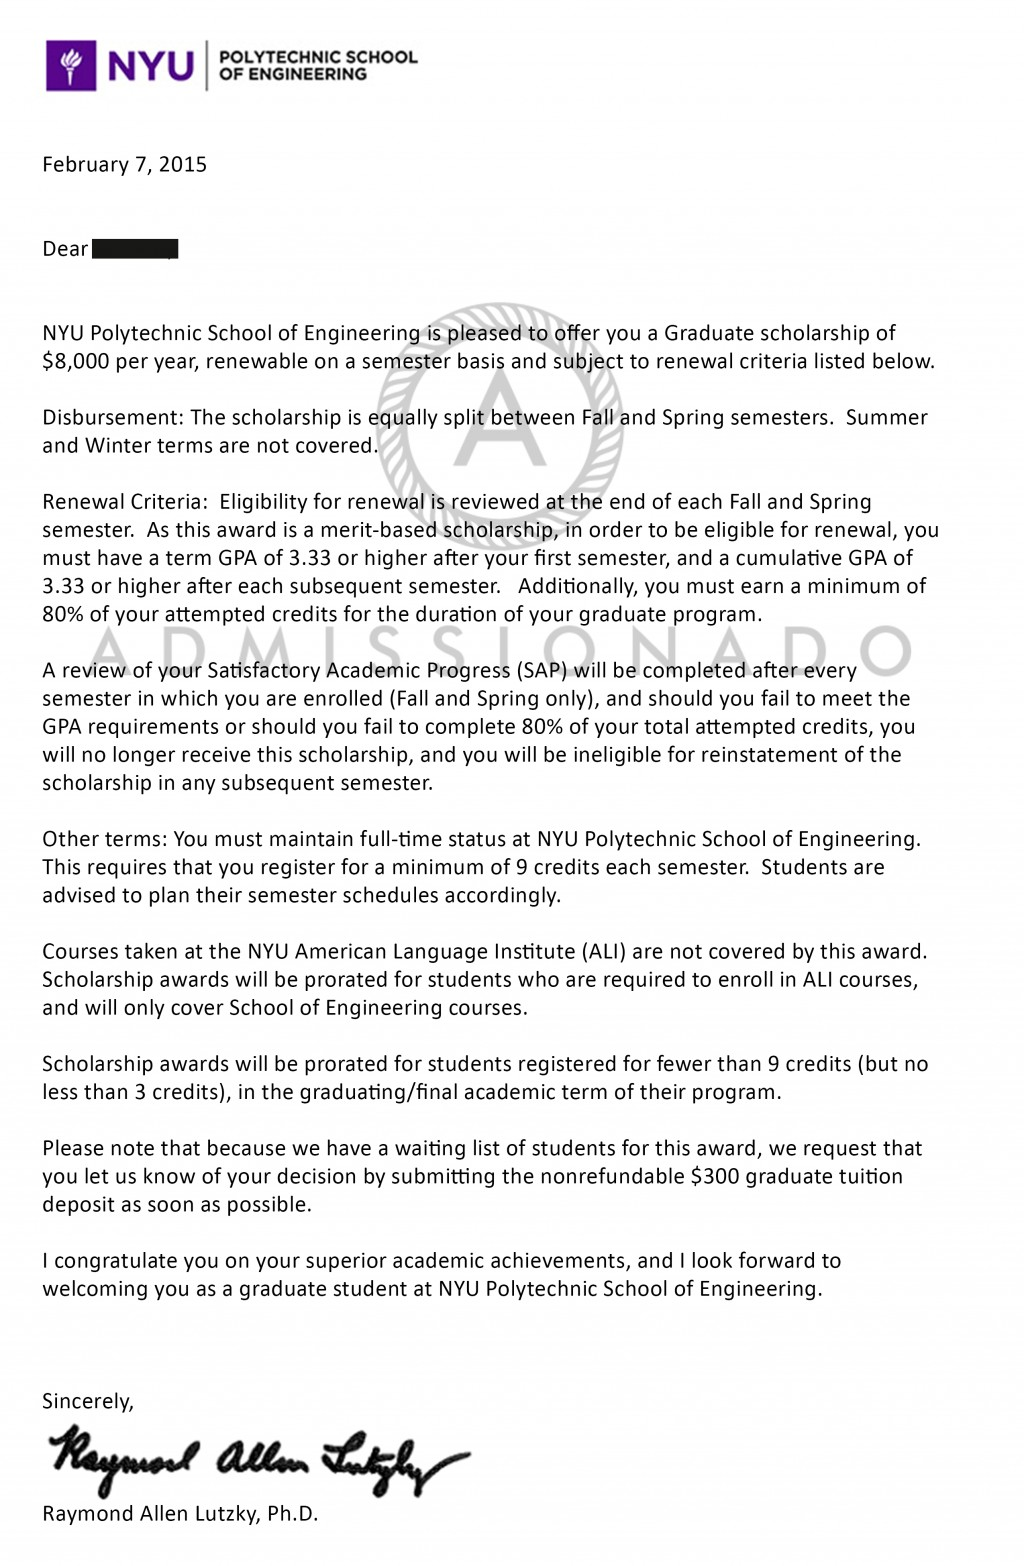 019 Nyu Essay Prompt Example Xz Acceptance Wondrous Prompts 2018 Undergraduate Large